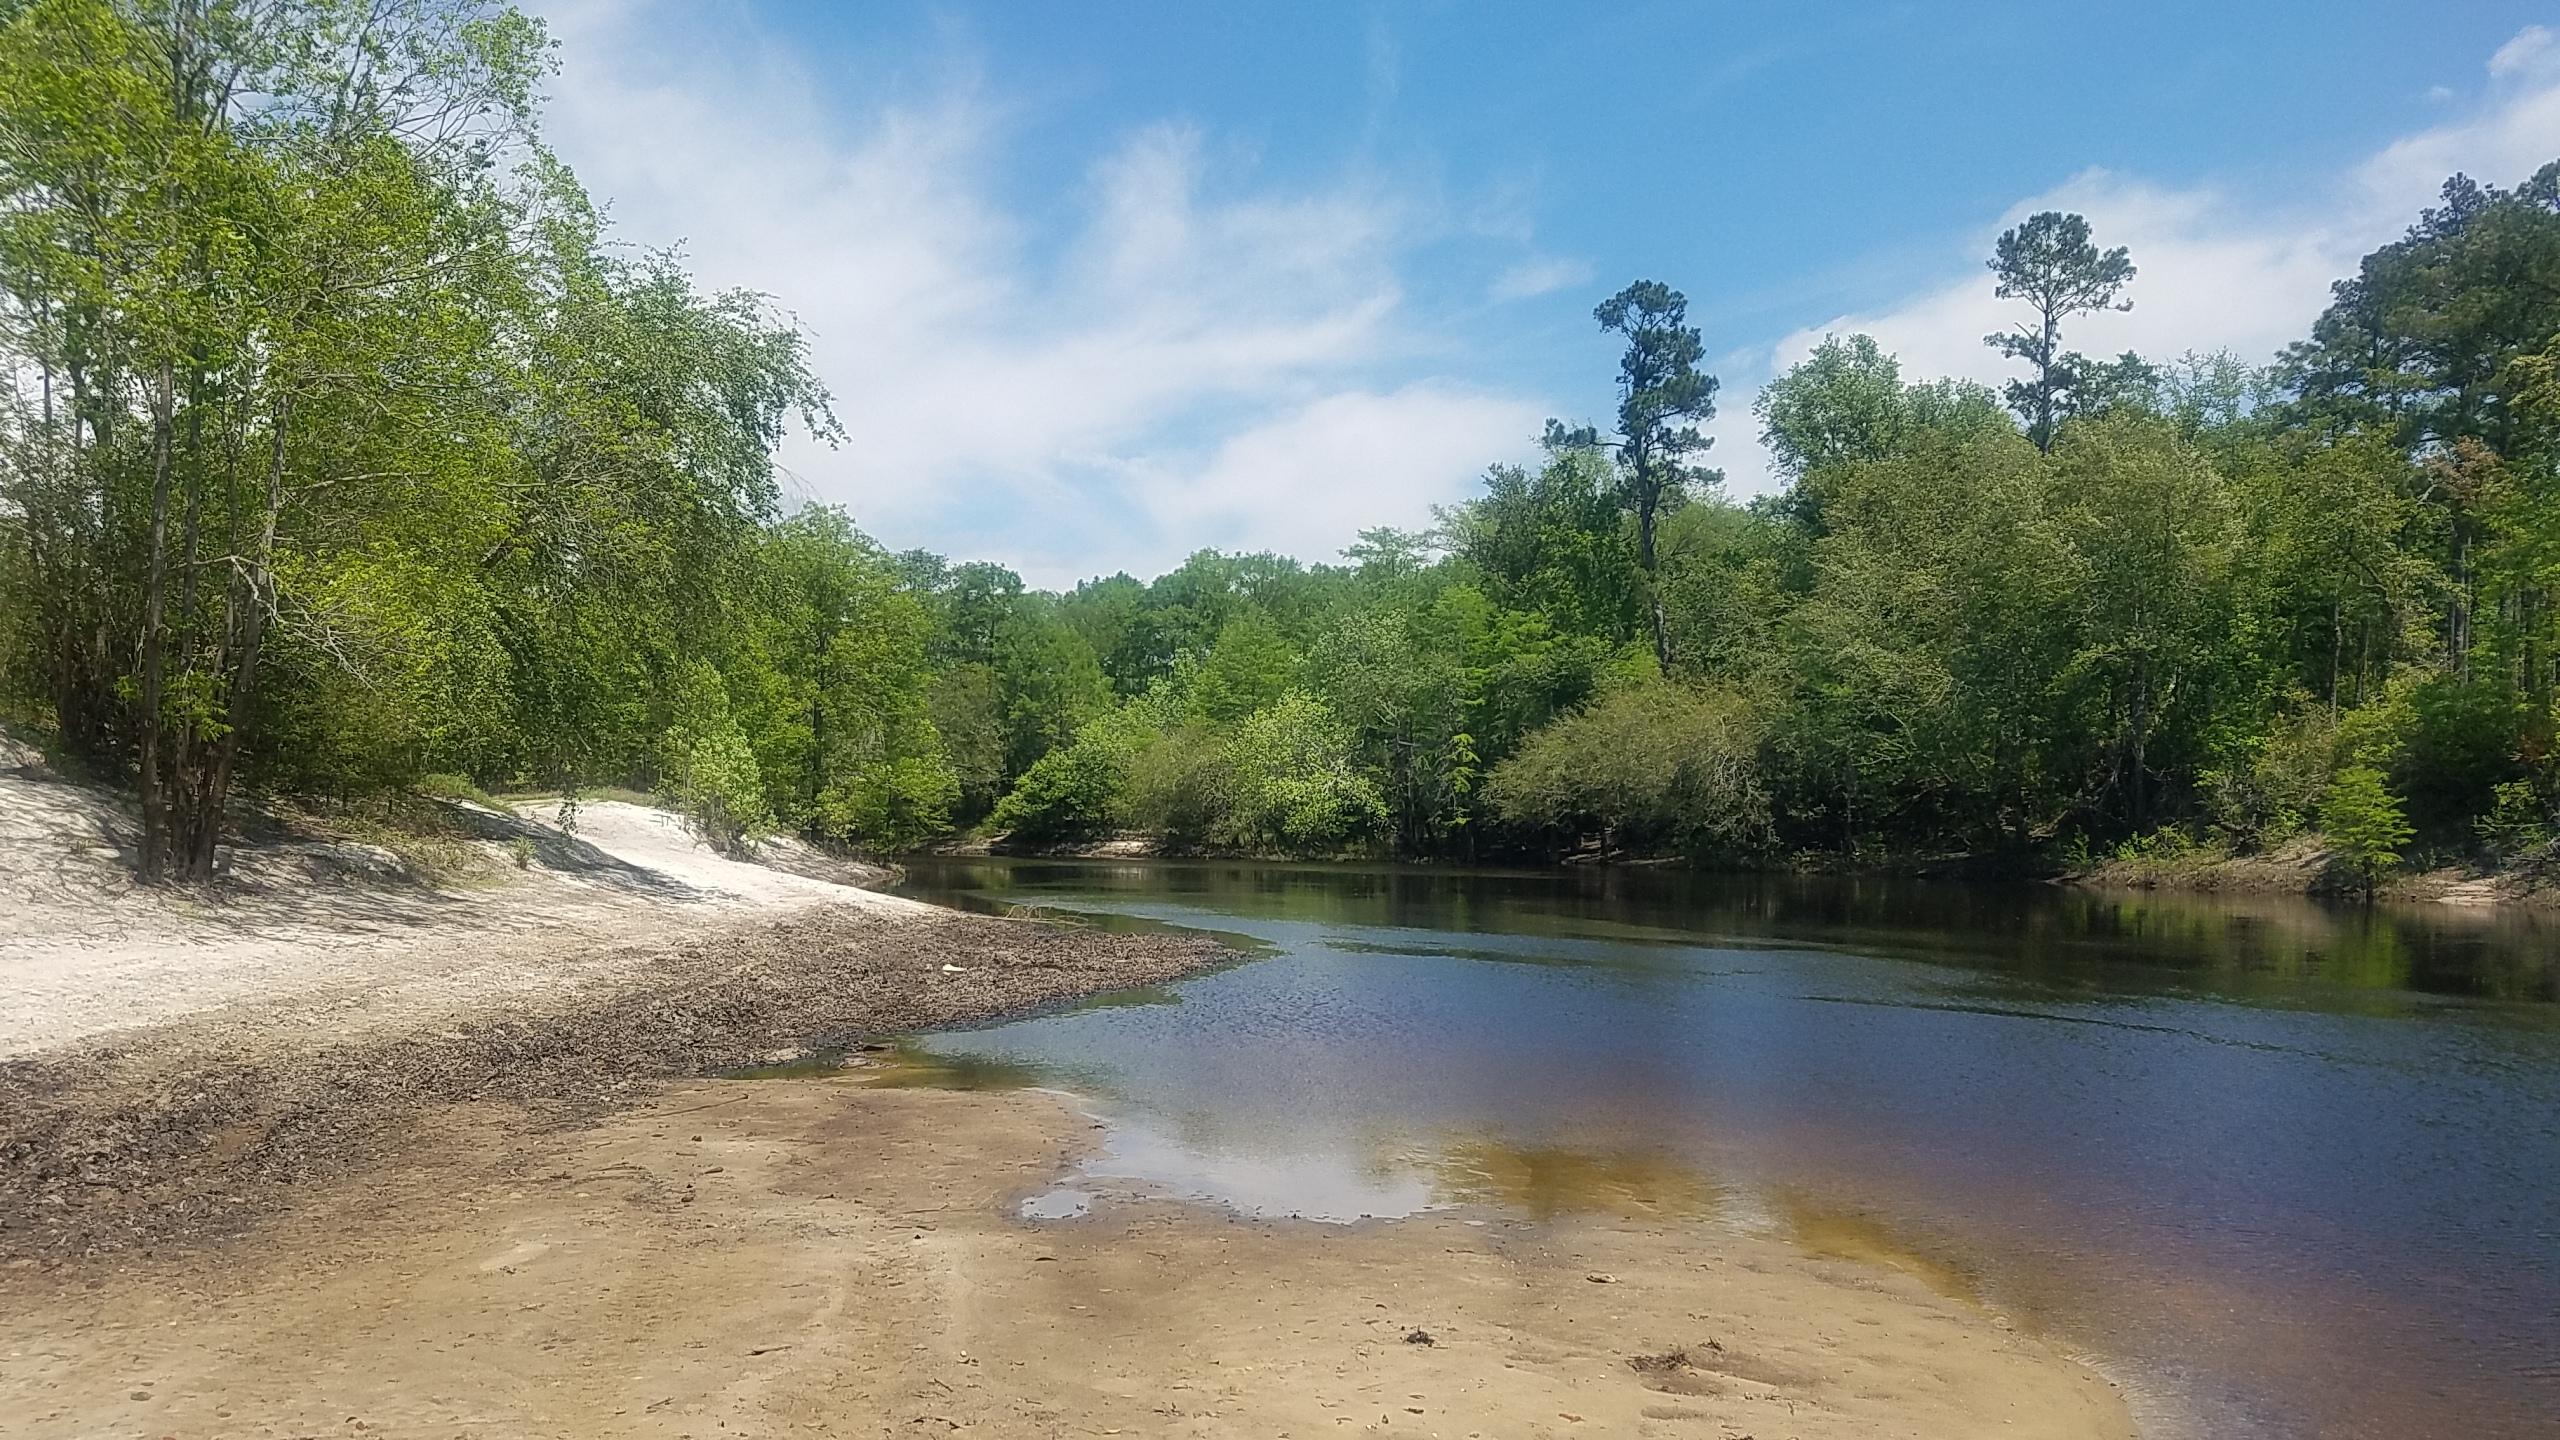 2560x1440 Upstream, Sandbar, in Pafford's Landing, Alapaha River Water Trail, by John S. Quarterman, for WWALS.net, 26 April 2018